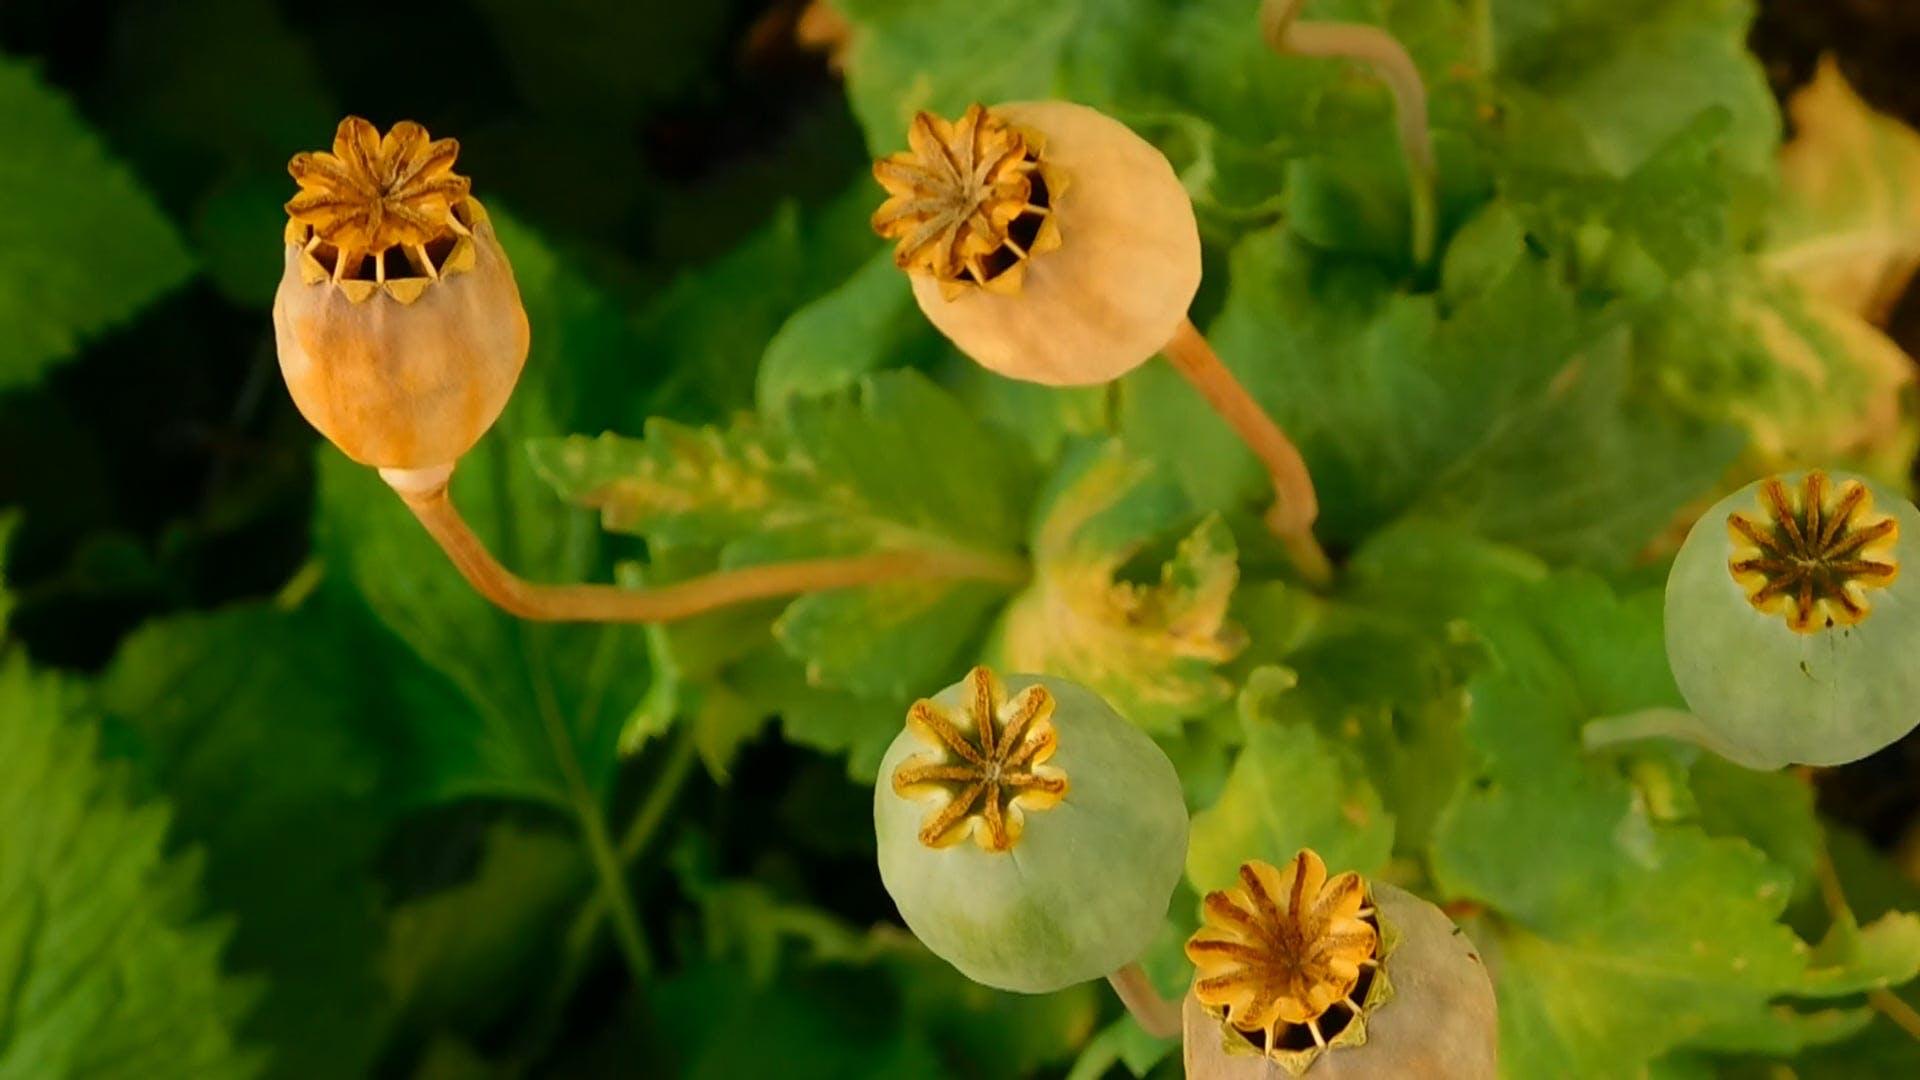 Poppy Seed Pods in the Garden